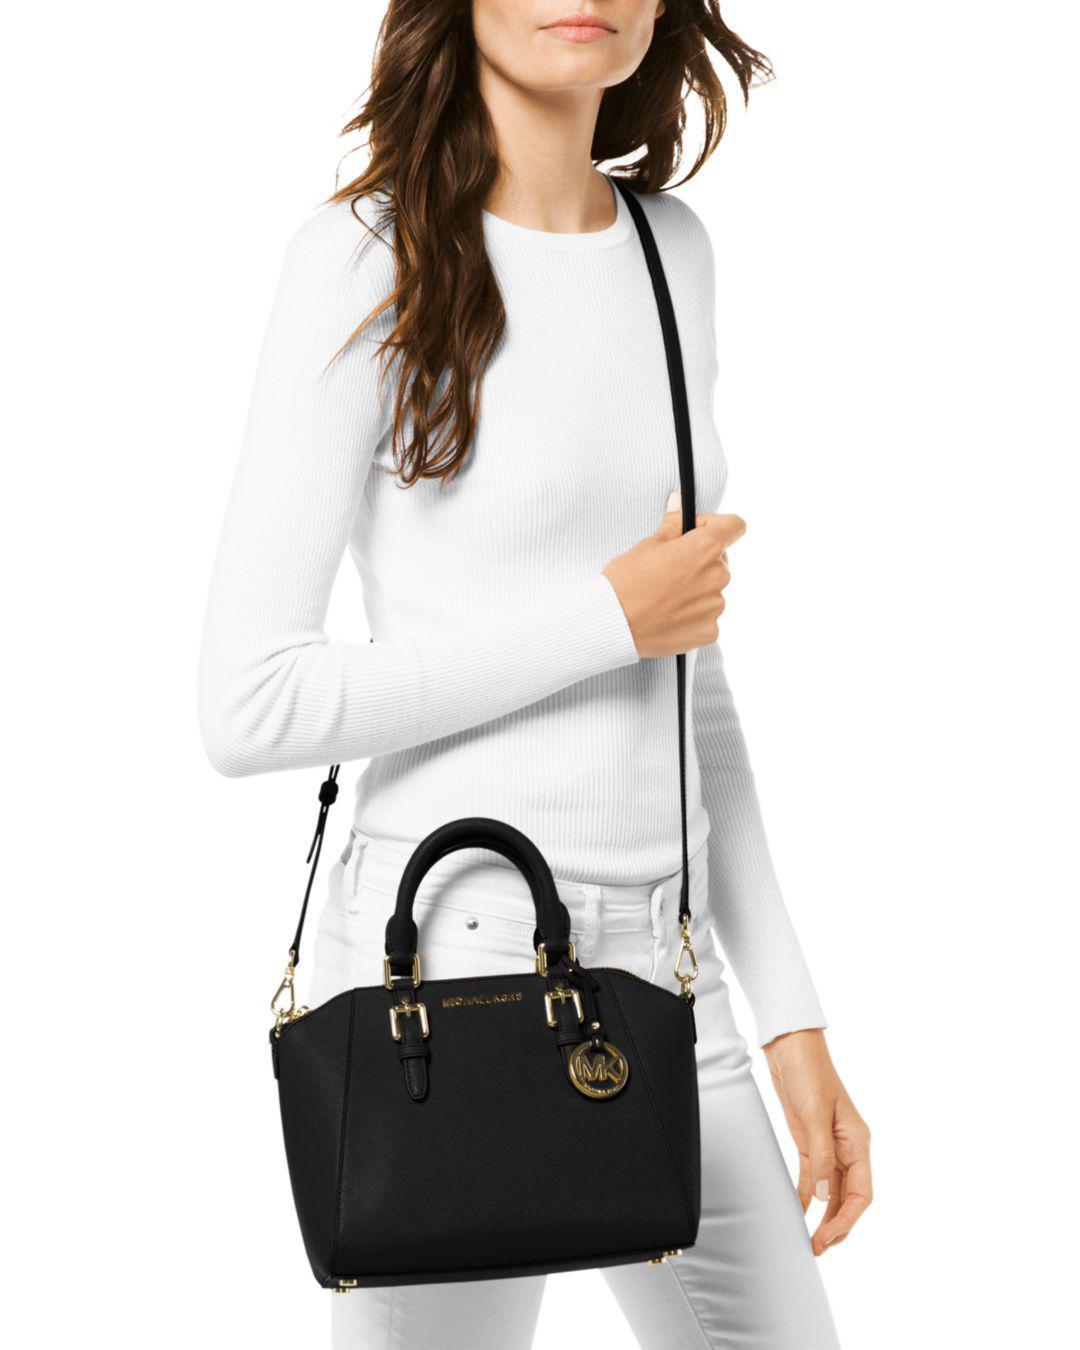 78f3cc4be213 Lyst - MICHAEL Michael Kors Ciara Medium Leather Messenger Bag in Black